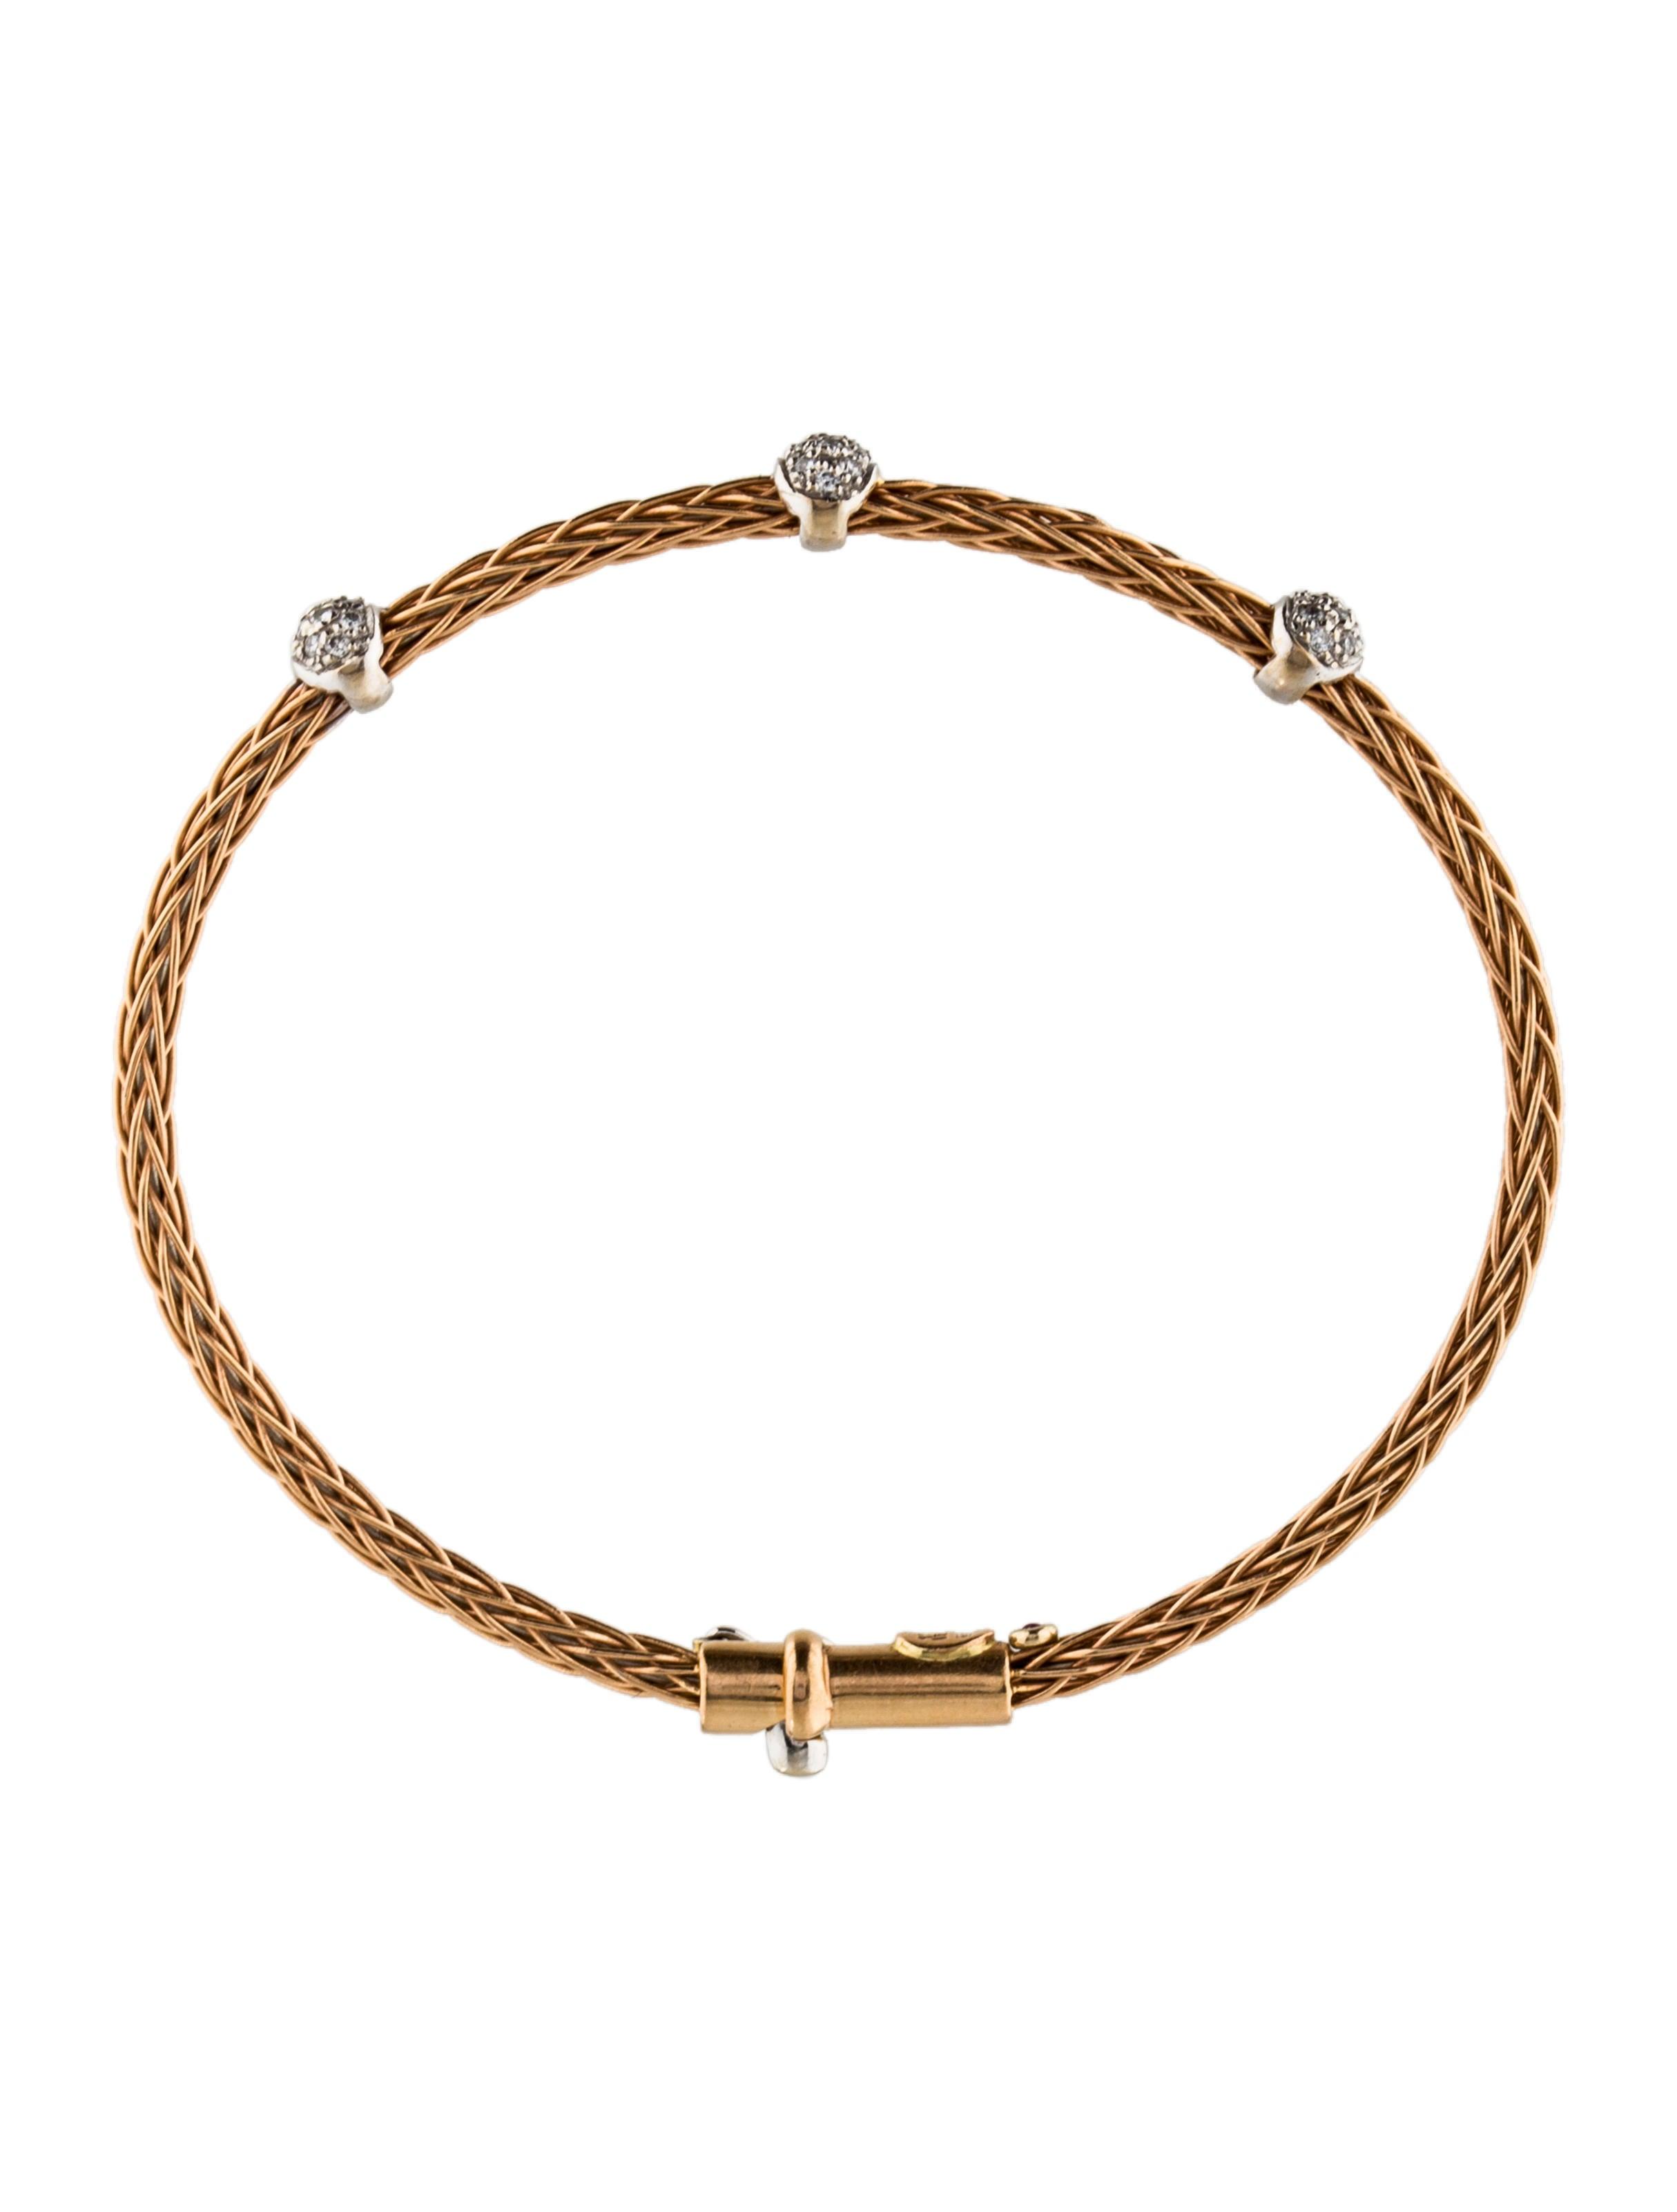 roberto coin 18k spiga diamond station bangle bracelets. Black Bedroom Furniture Sets. Home Design Ideas